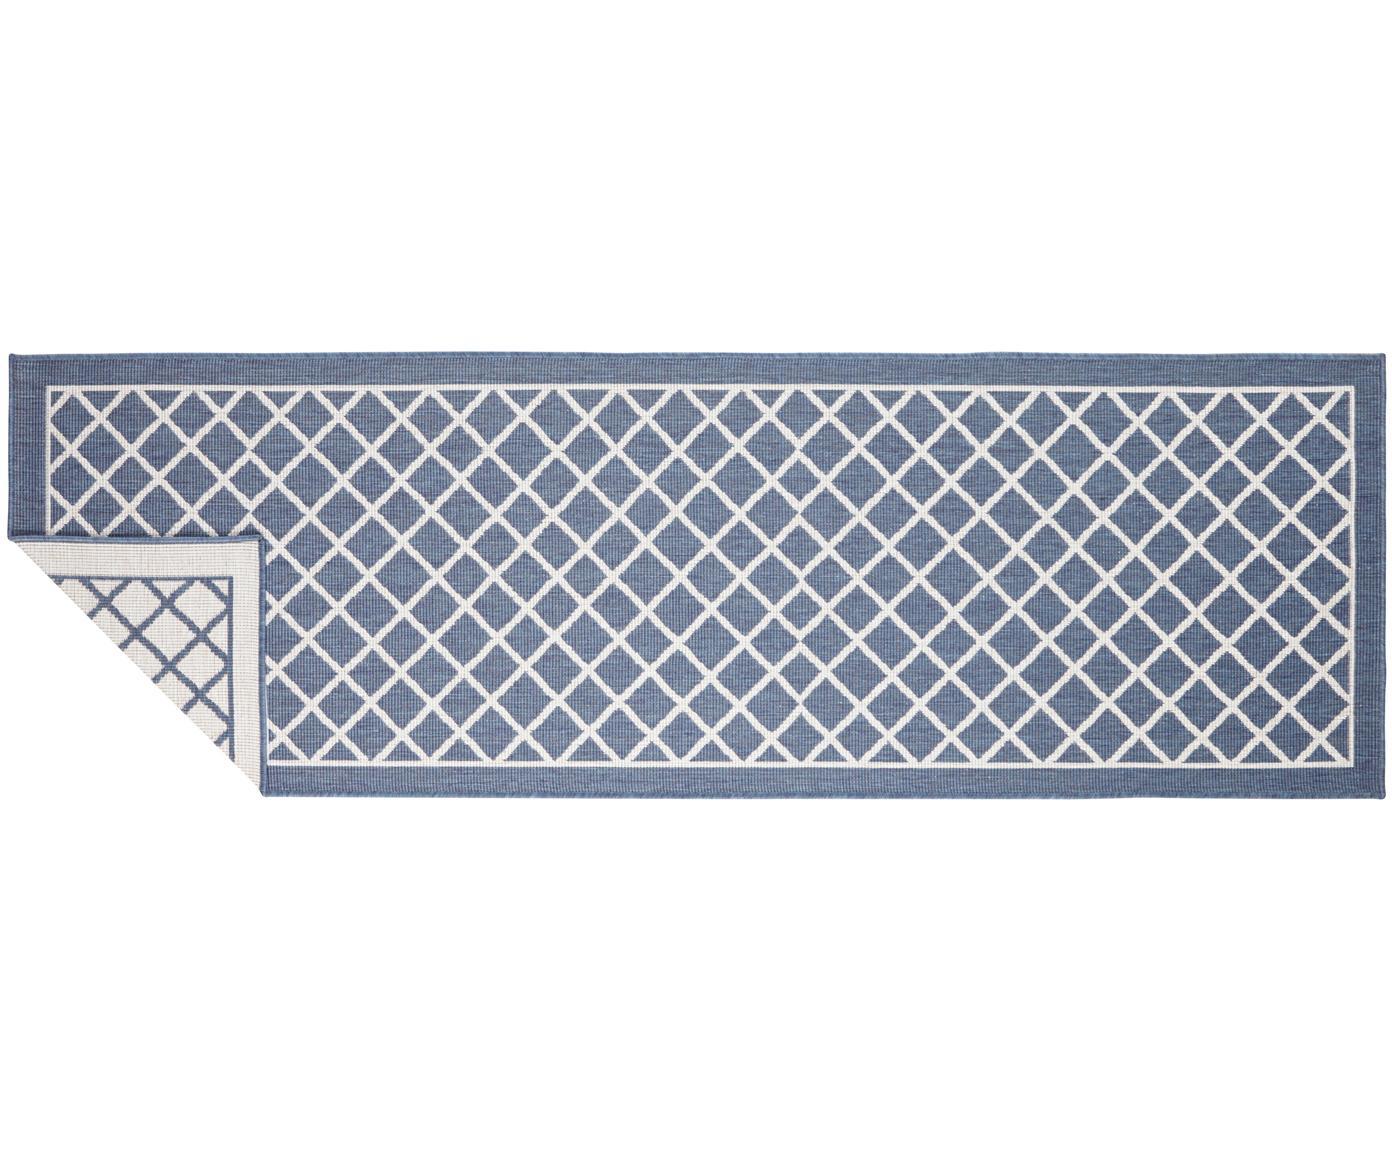 Alfombra reversible de interior y exterior Sydney, Azul, crema, An 80 x L 250 cm